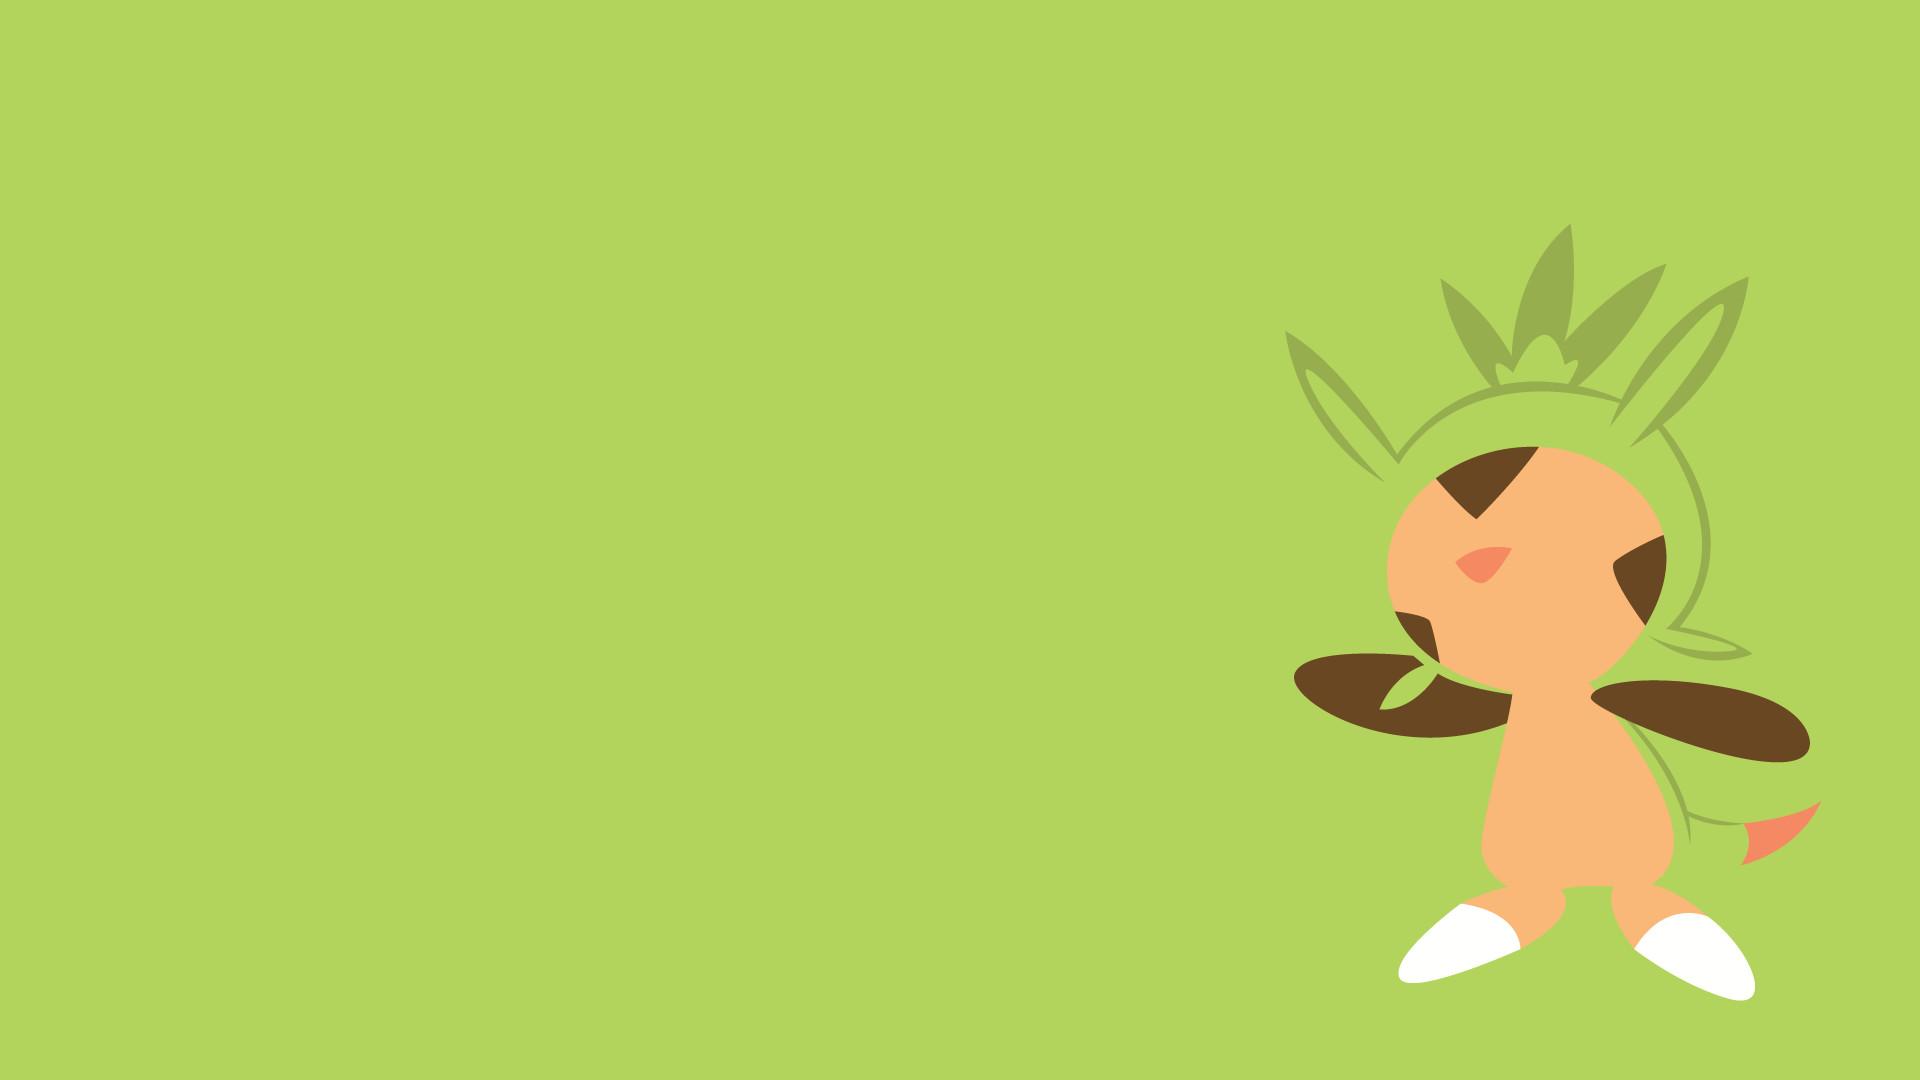 pokemon x y wallpaper hd 79 images